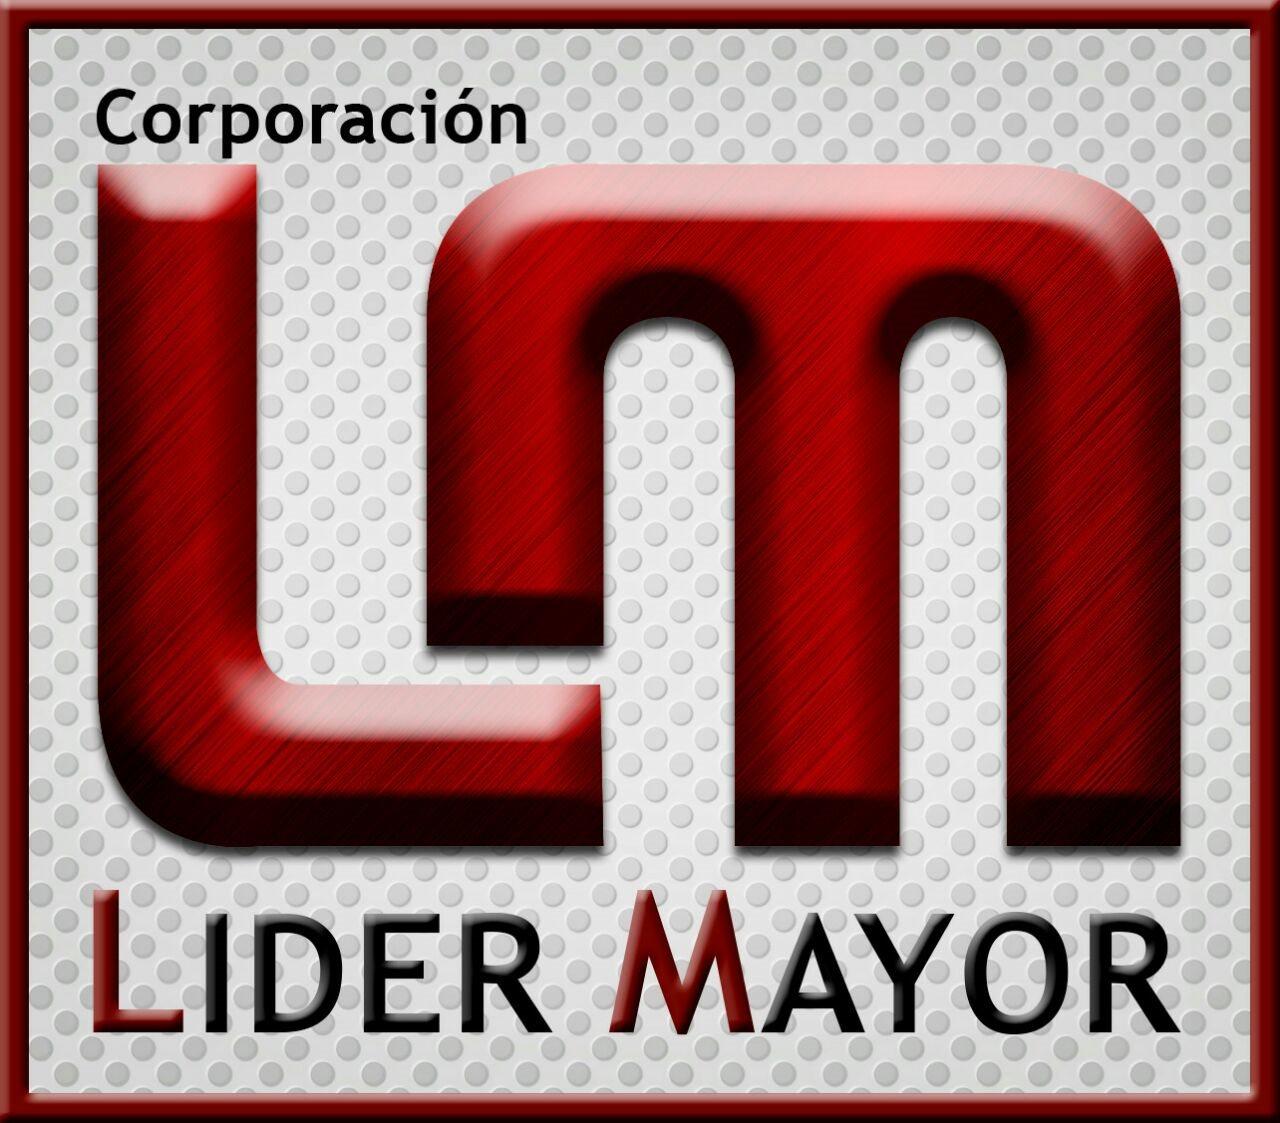 CORPORACION LIDER MAYOR, C.A